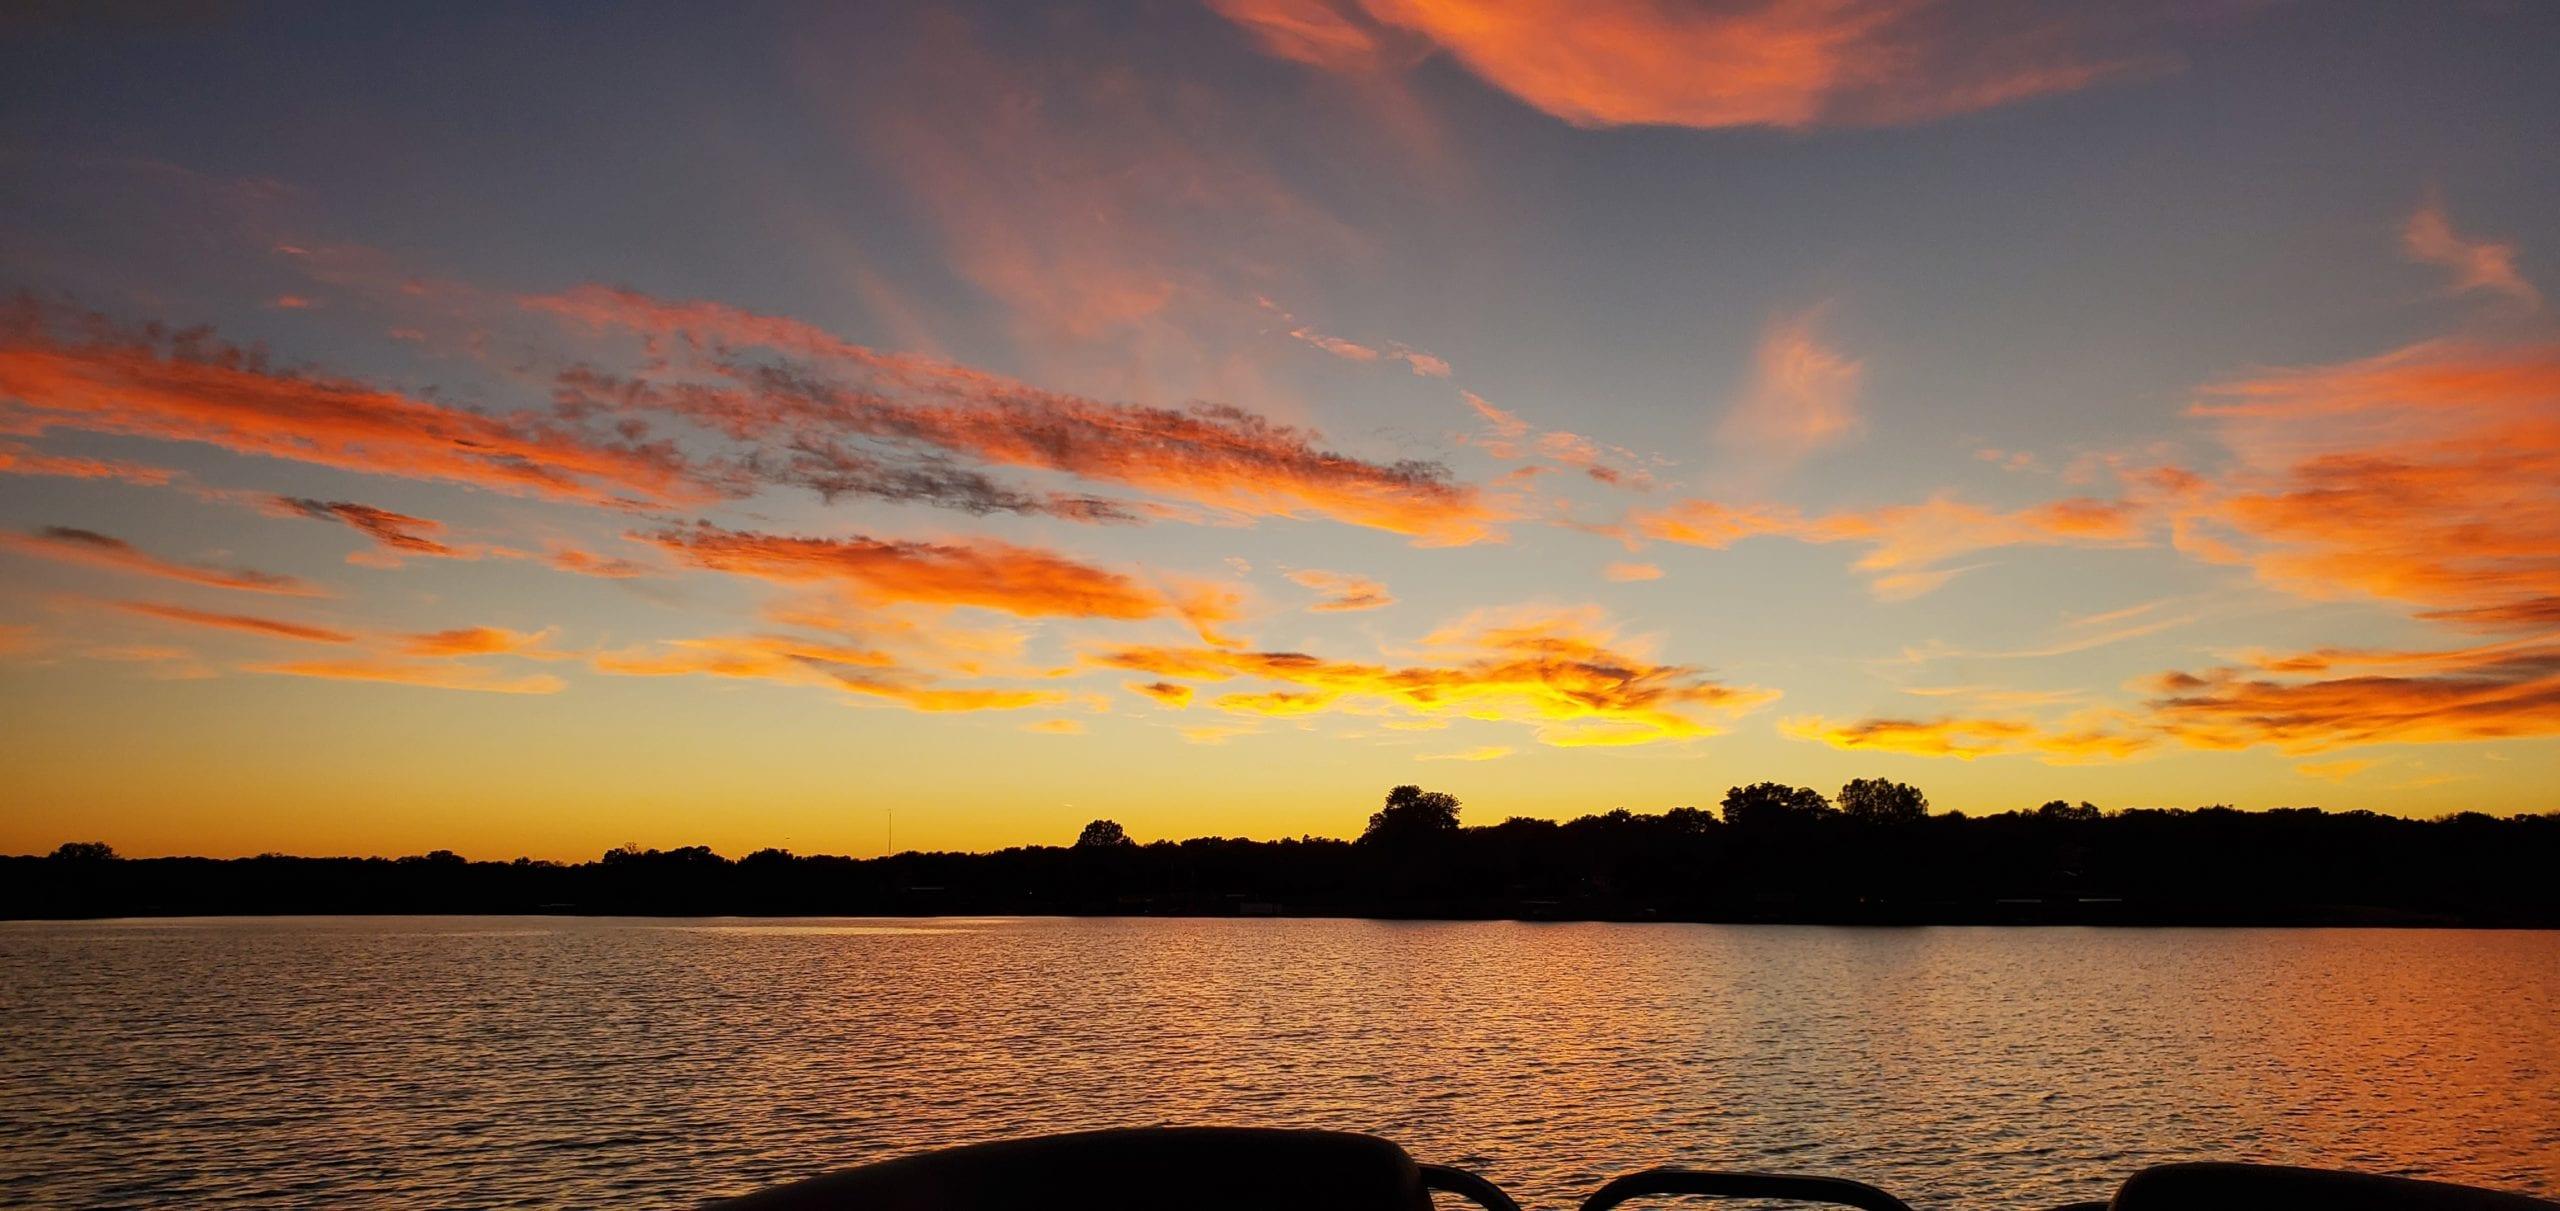 Lake Hiwassee - Sunset Image